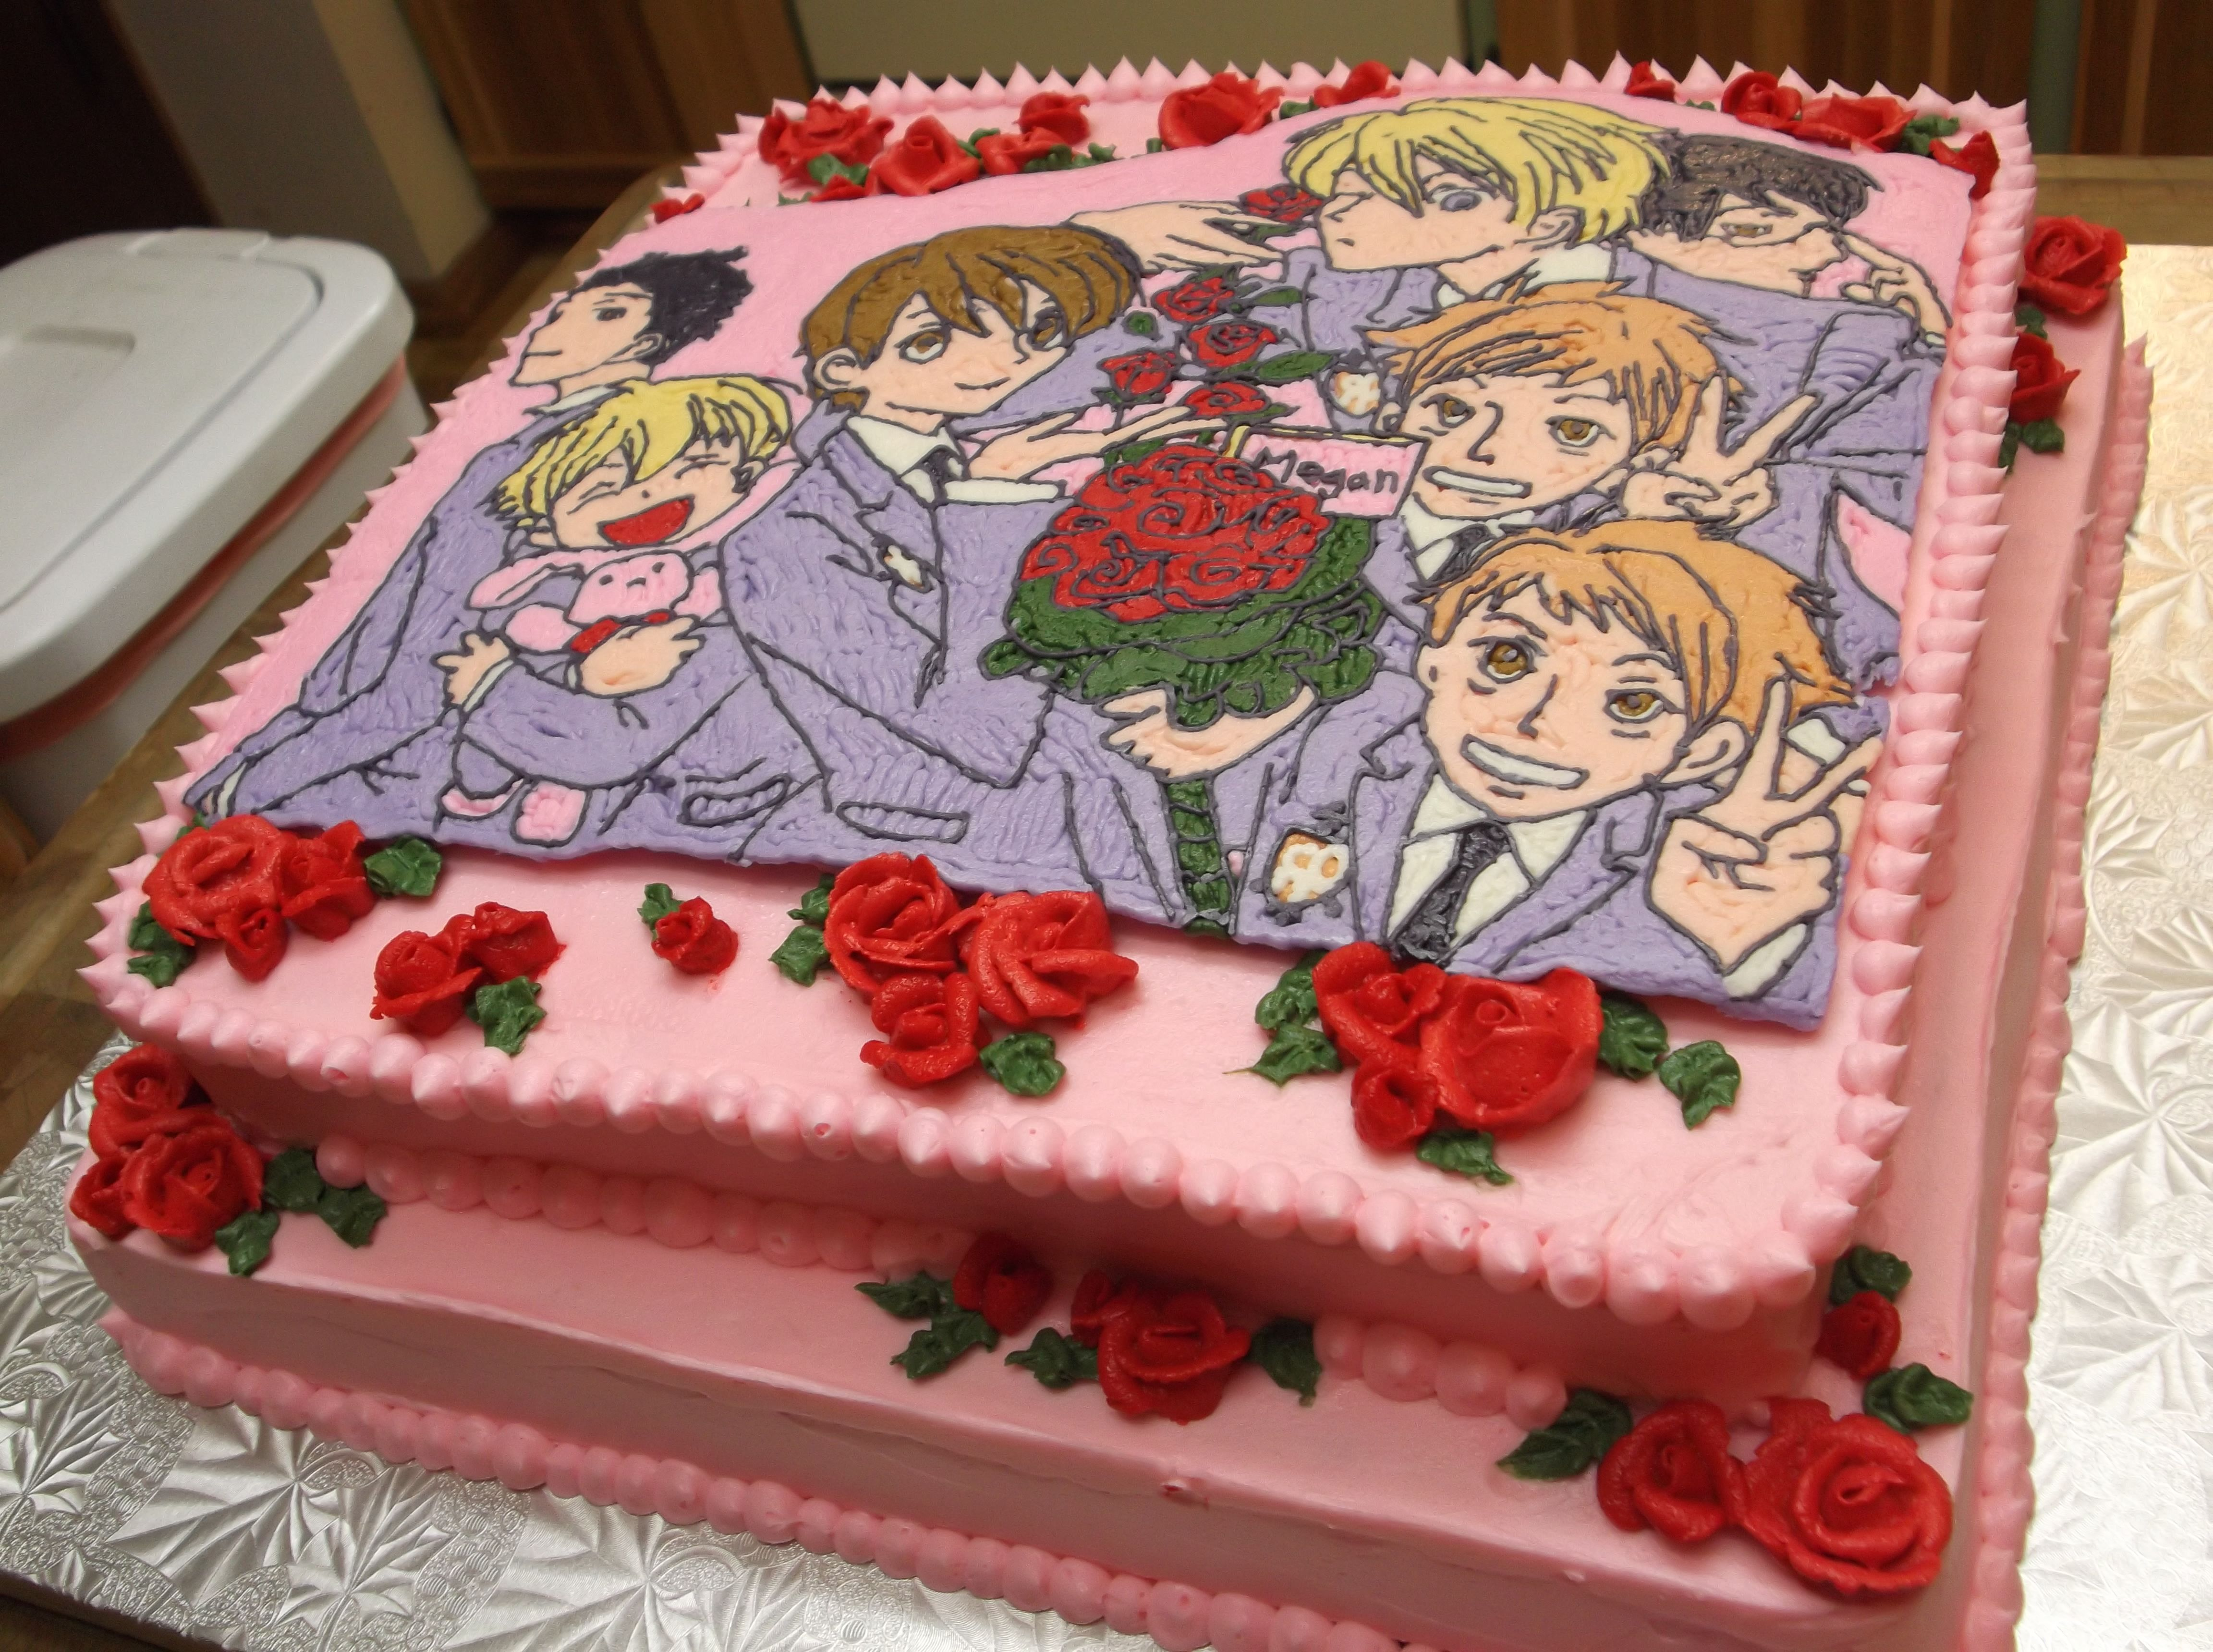 My Ouran High School Host Club Birthday Cake. A delicious